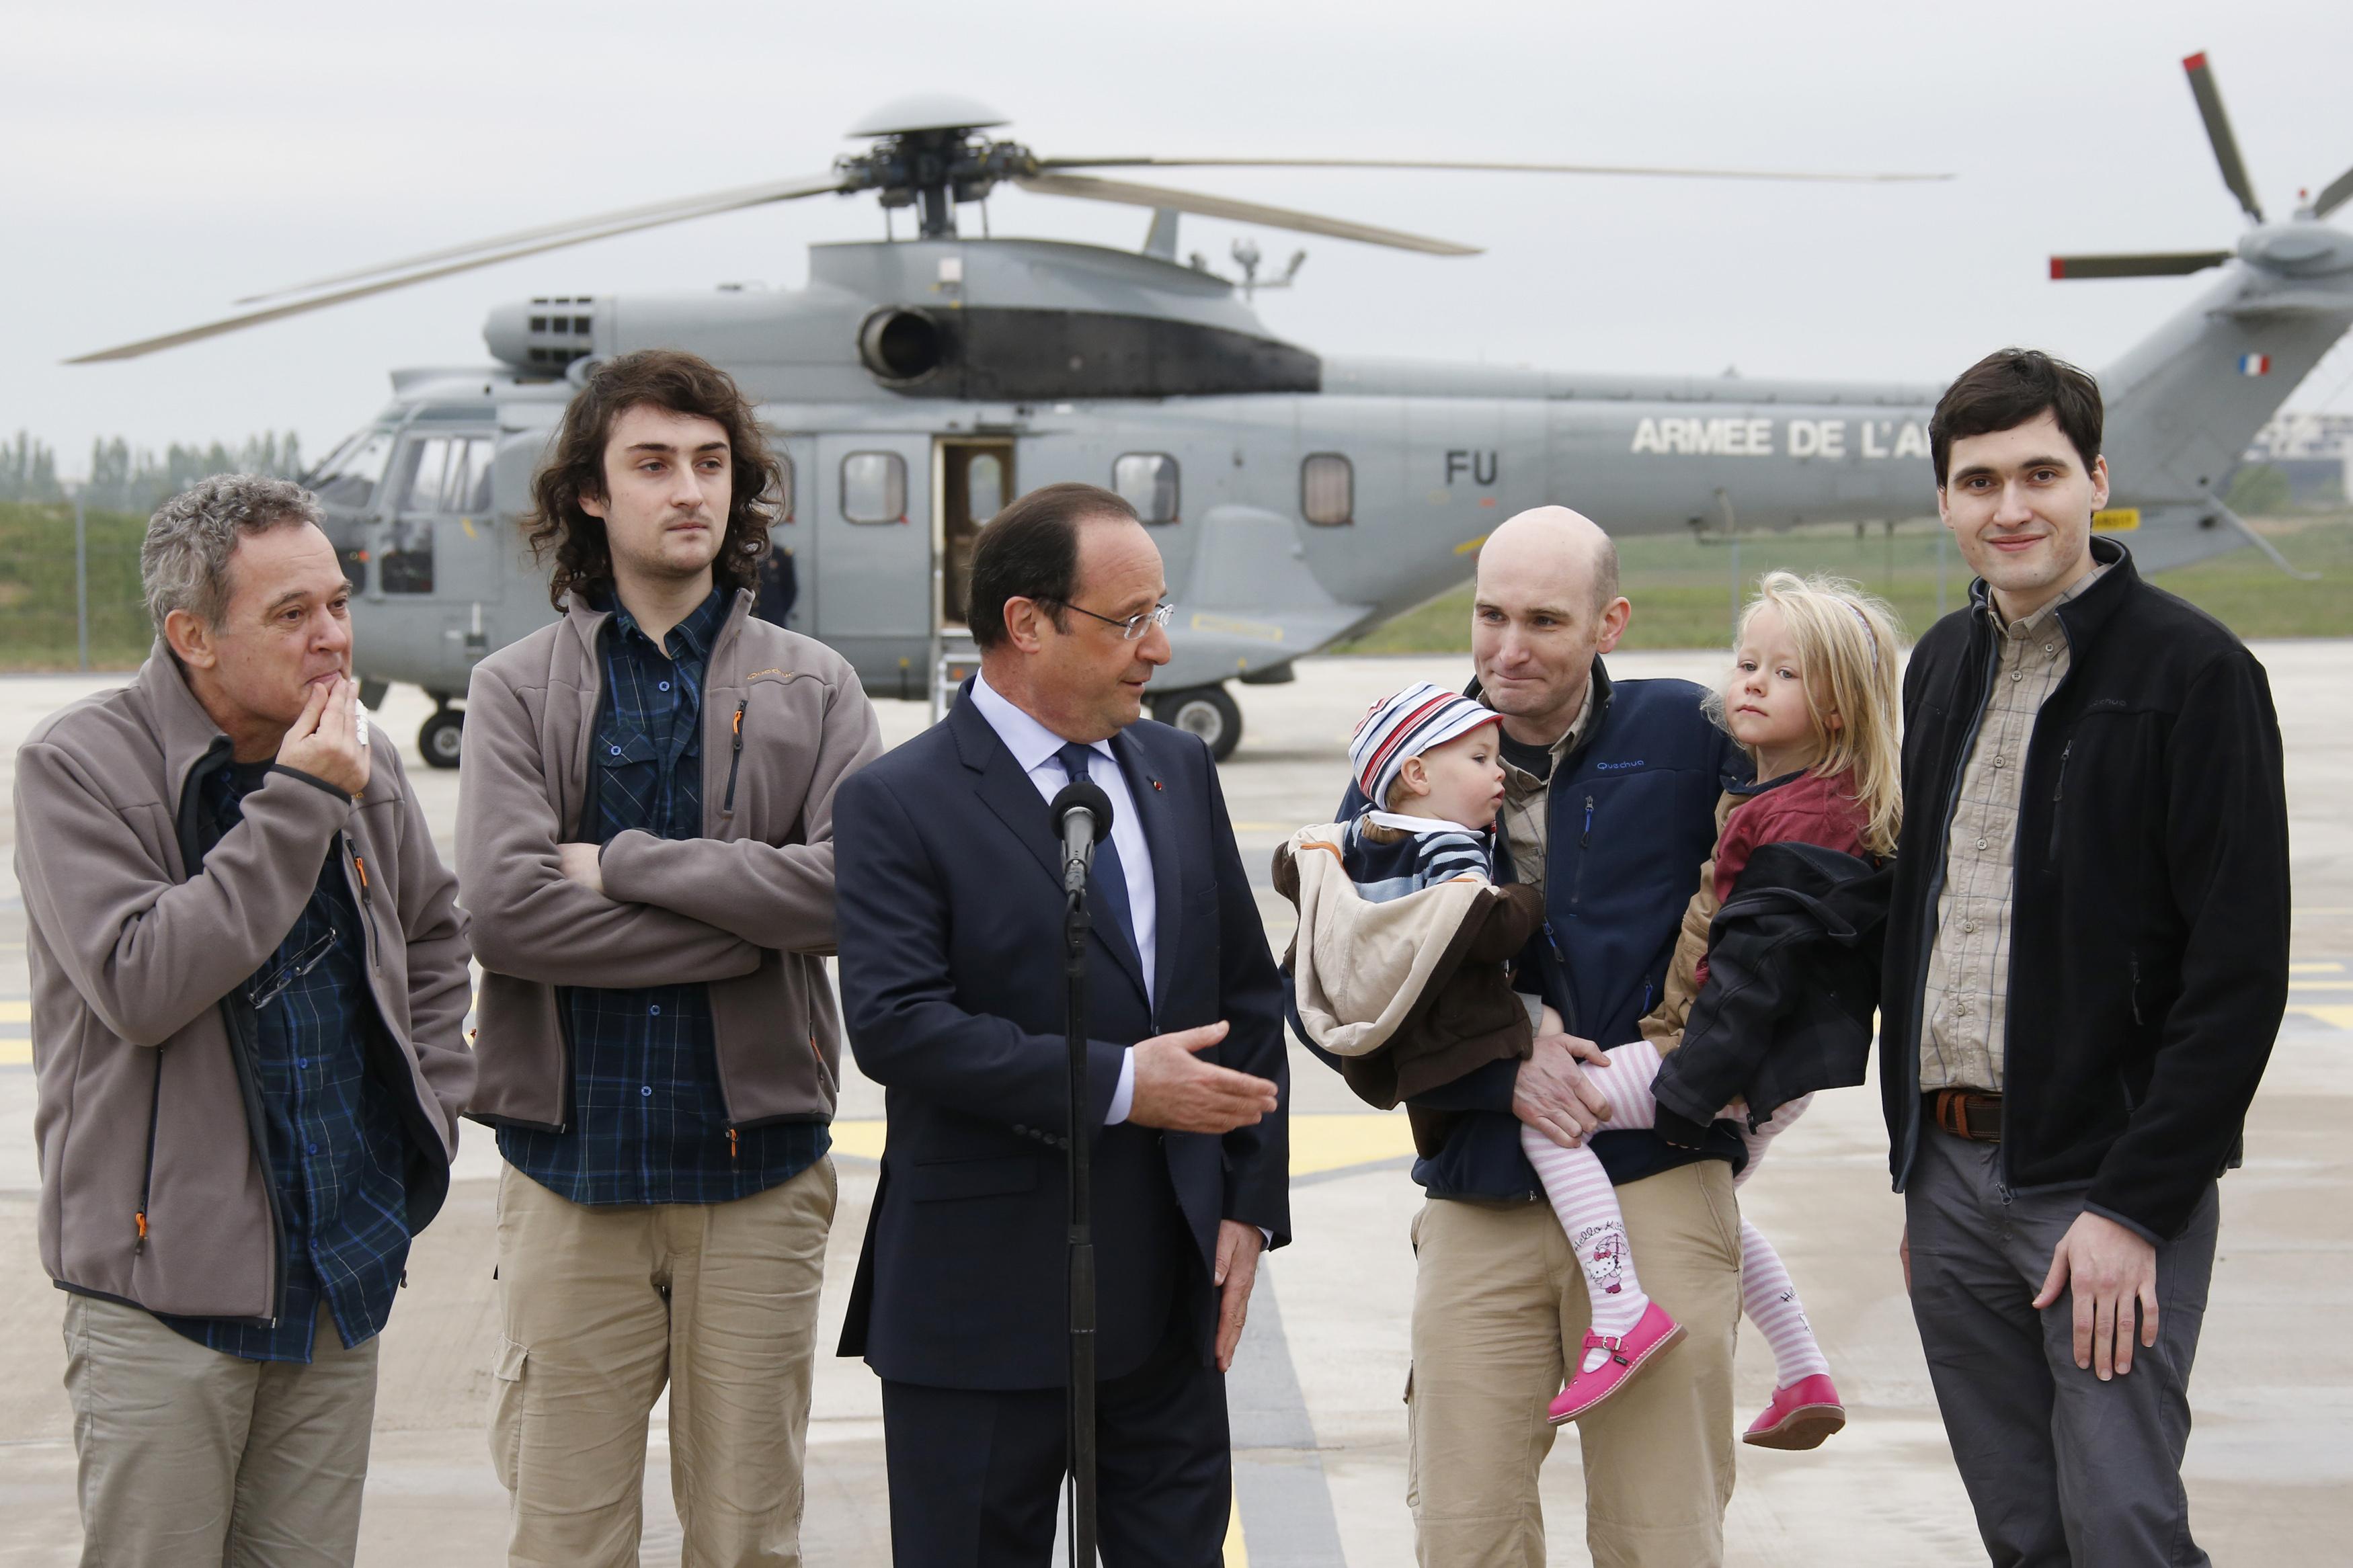 Left to right: Didier Francois, Edouard Elias, then-president of France Francois Hollande, Nicolas Henin and Pierre Torres. (REUTERS)